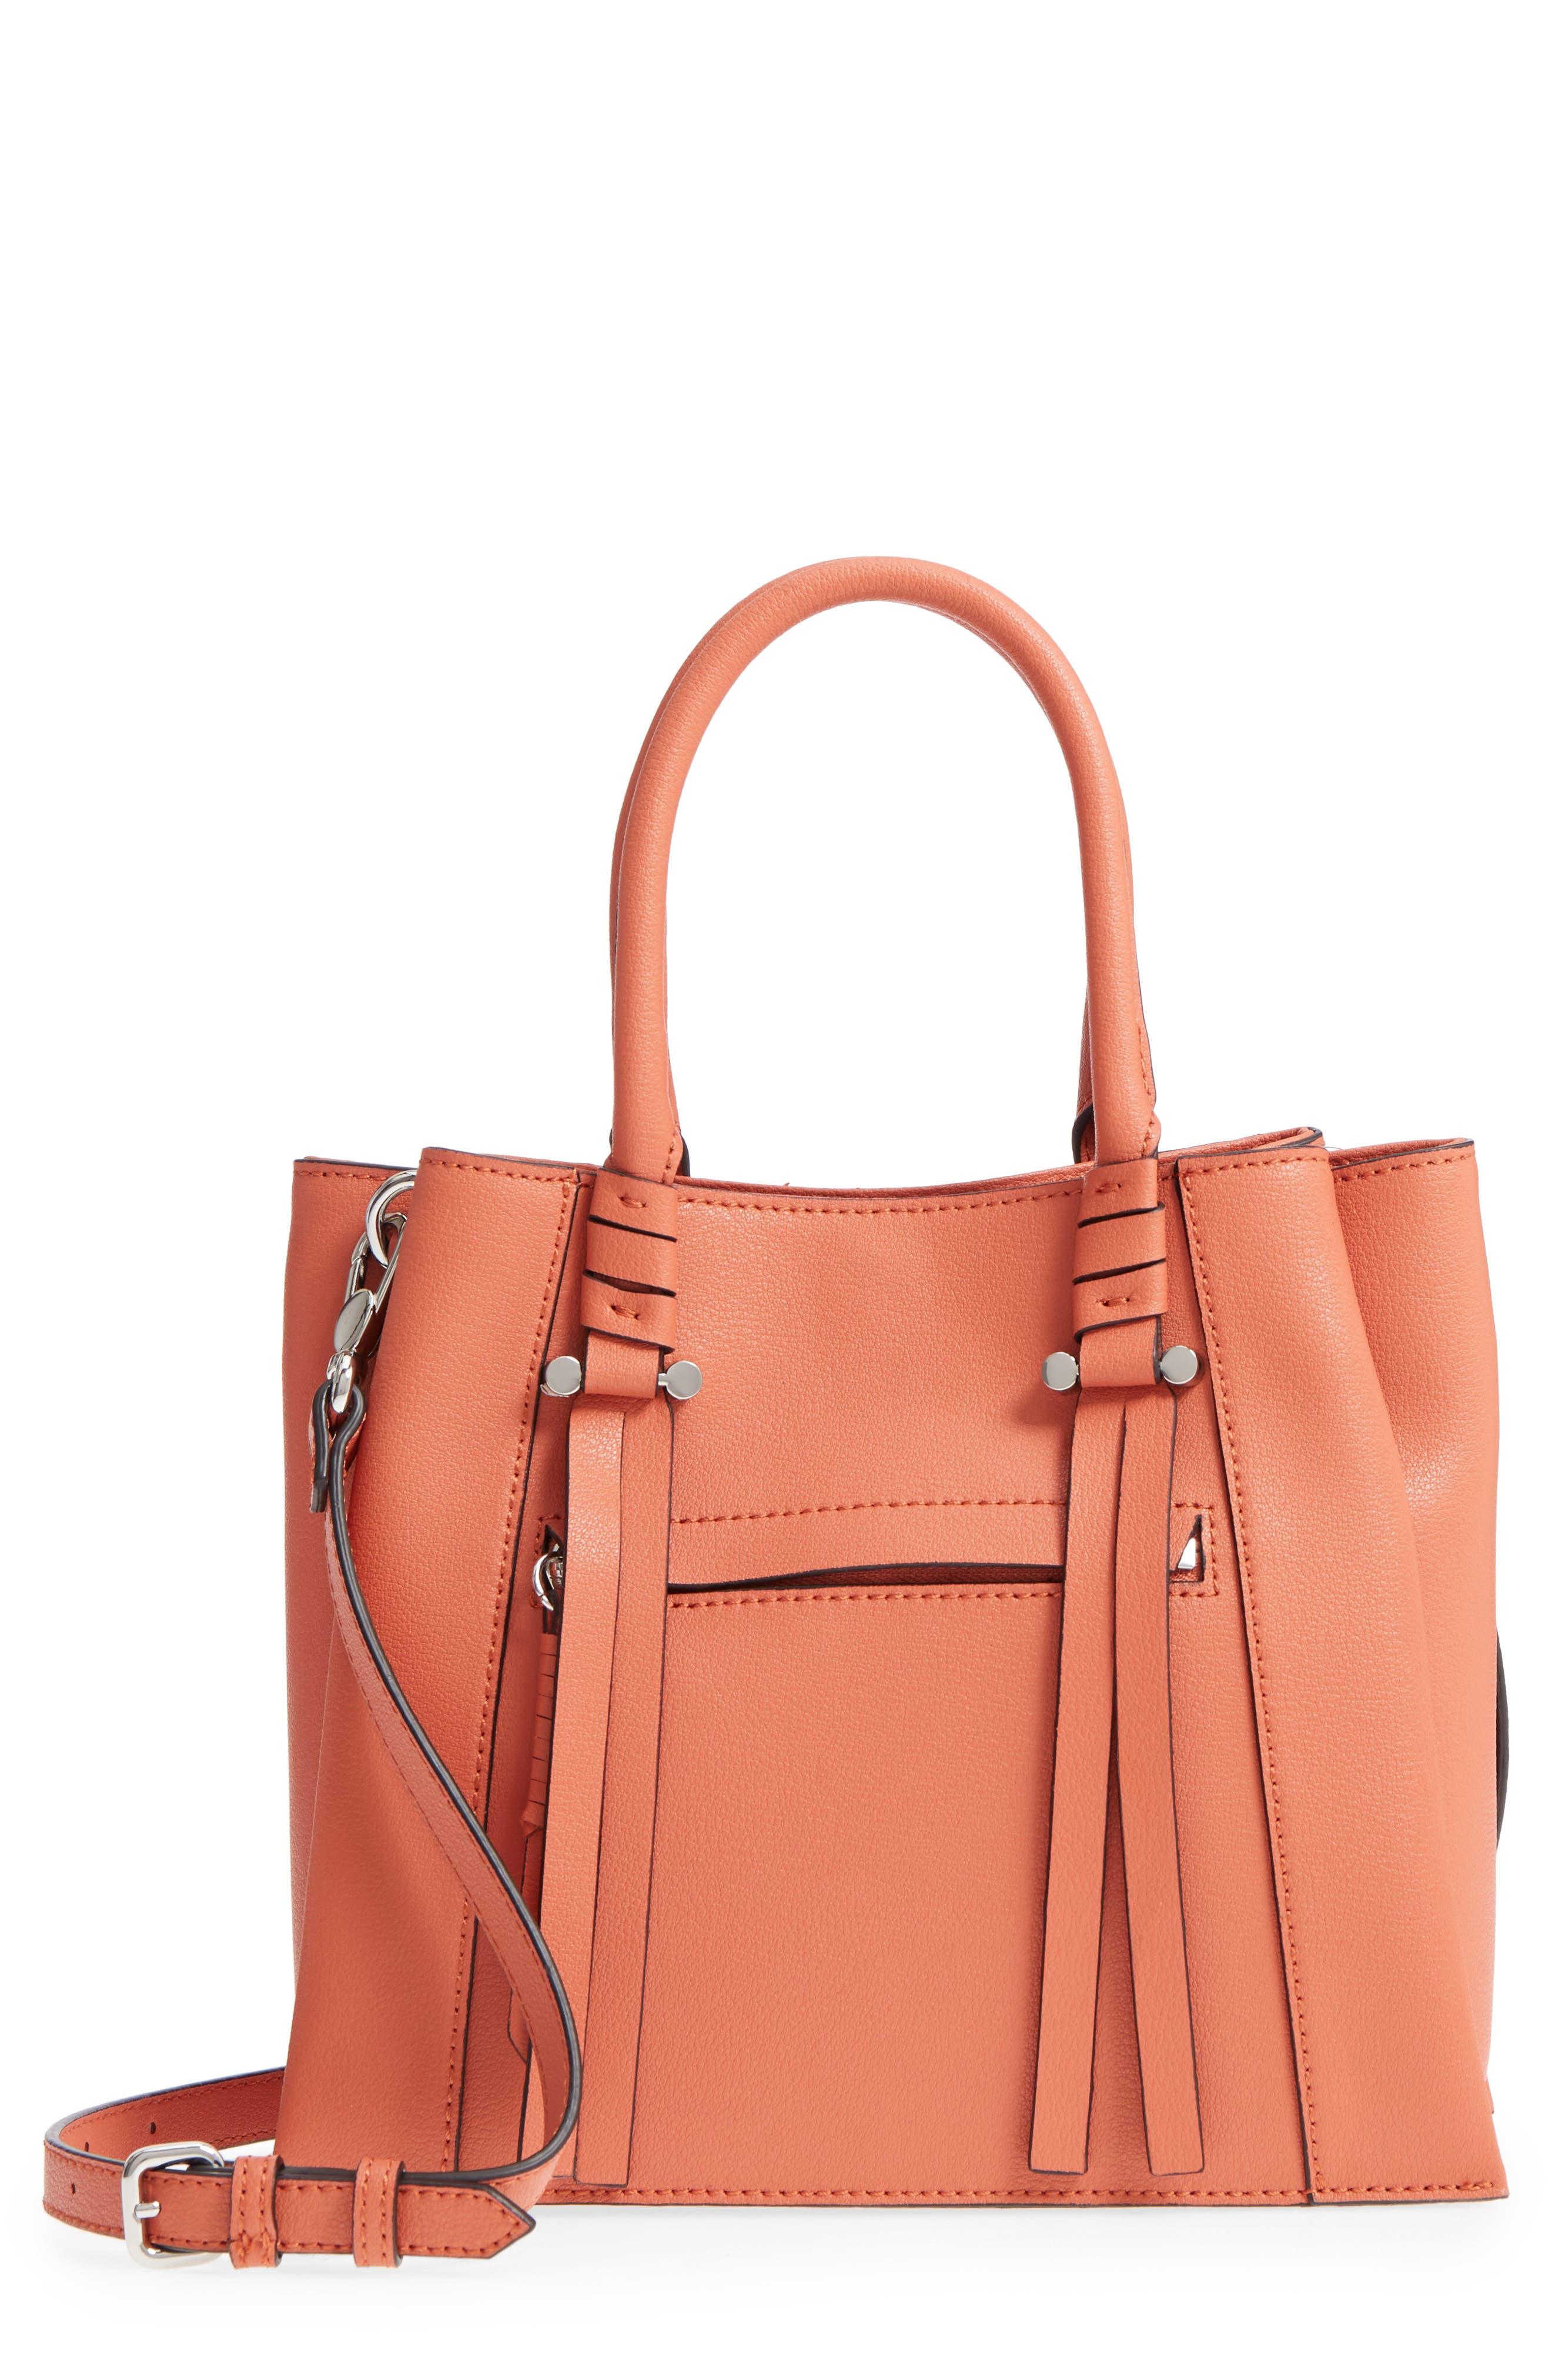 Everly Mini Shoulder Bag,                             Main thumbnail 1, color,                             Red